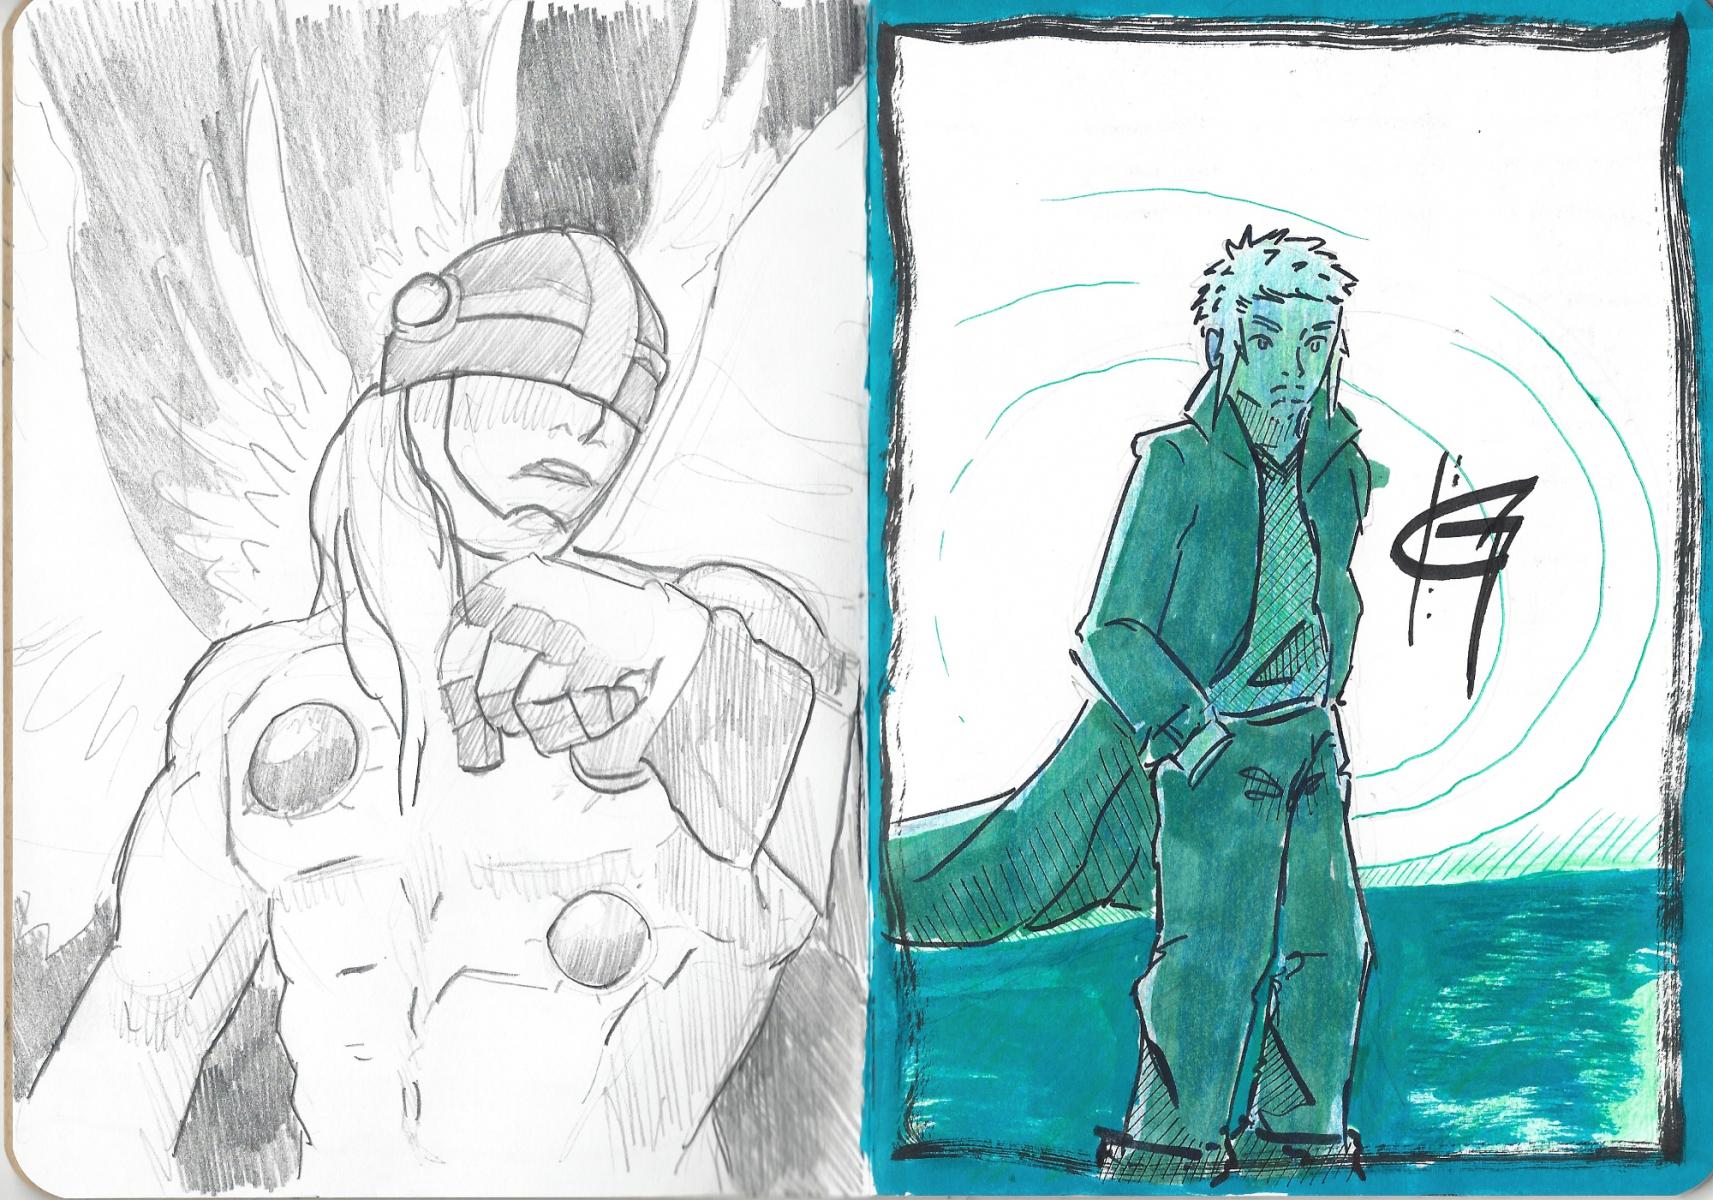 Sketchbookproject-Vol-18-B2772443-2